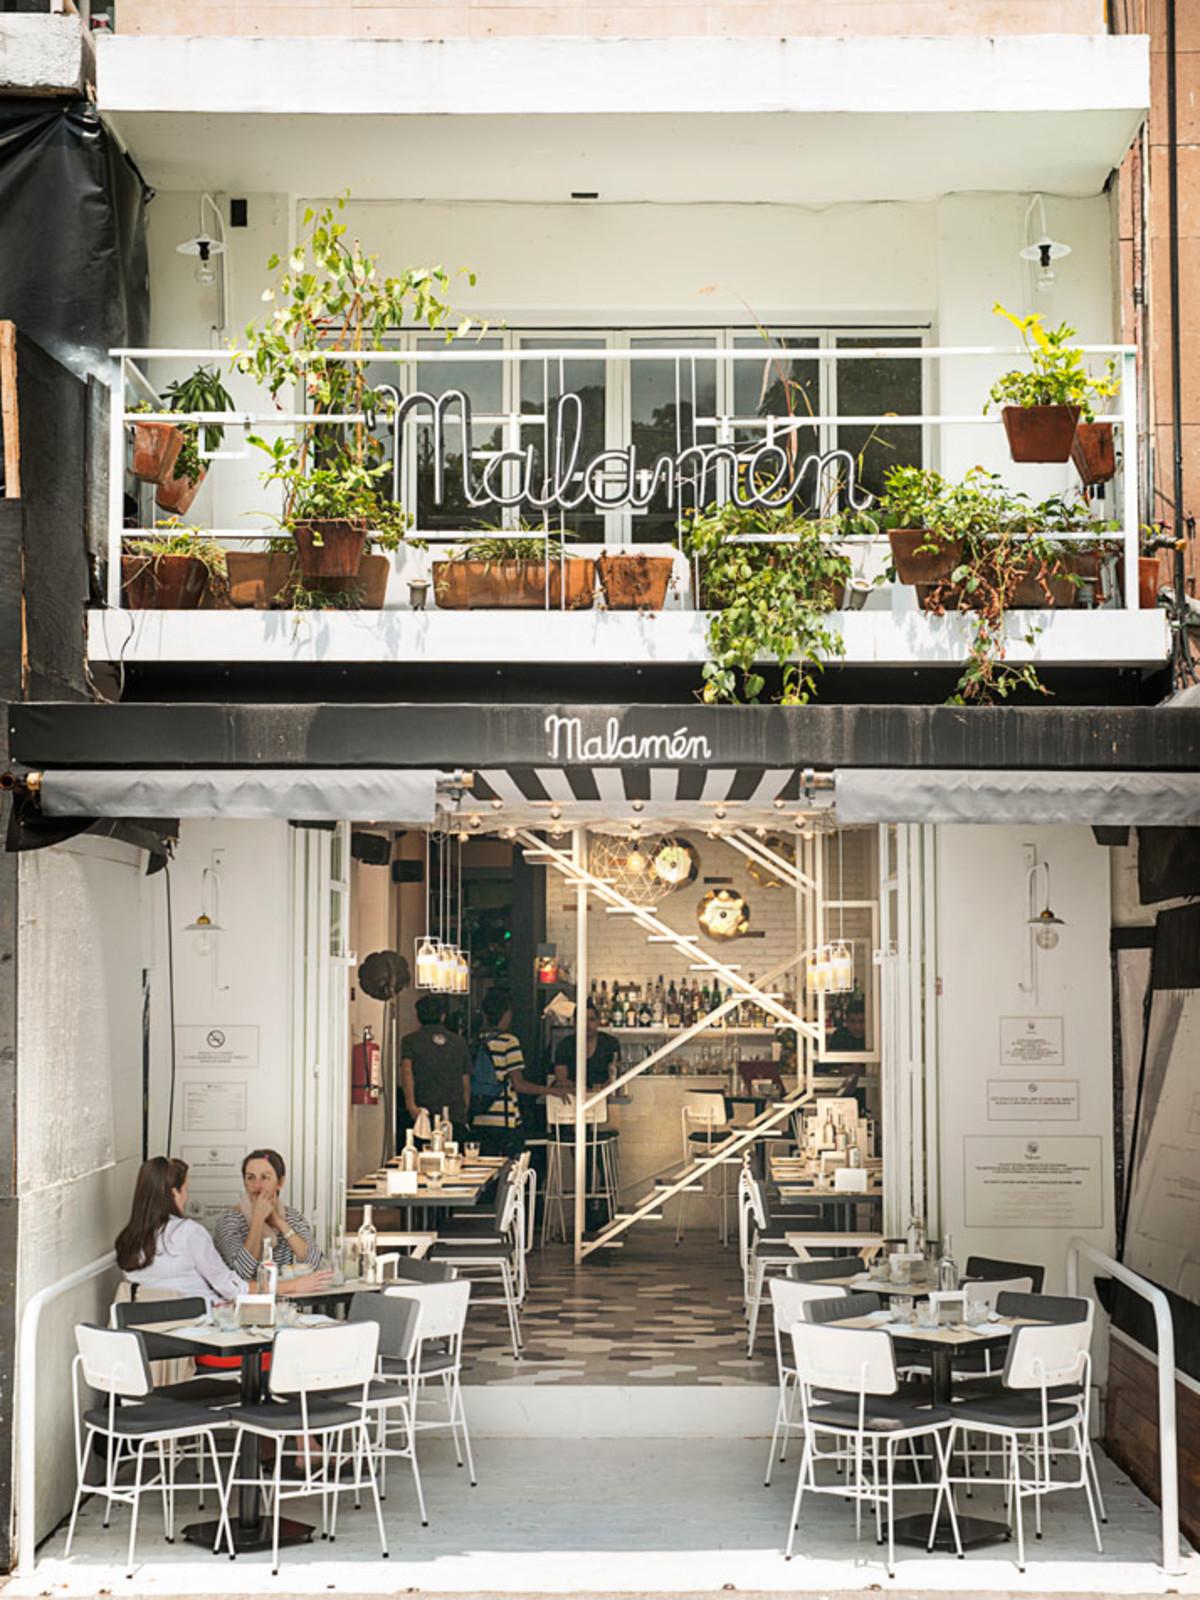 News, Shelby, Polanco in Mexico City, July 2015, Malamen Restaurant